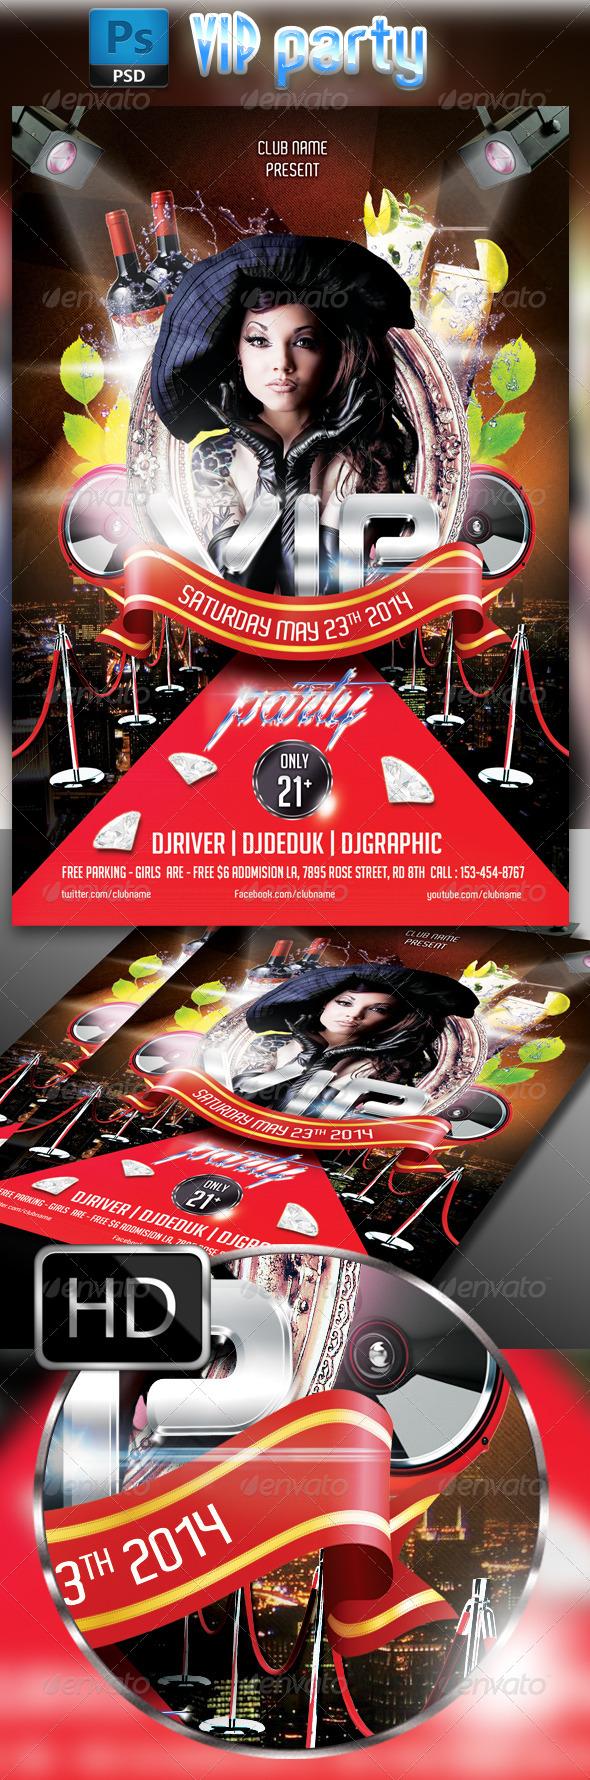 GraphicRiver VIP Party 7709866